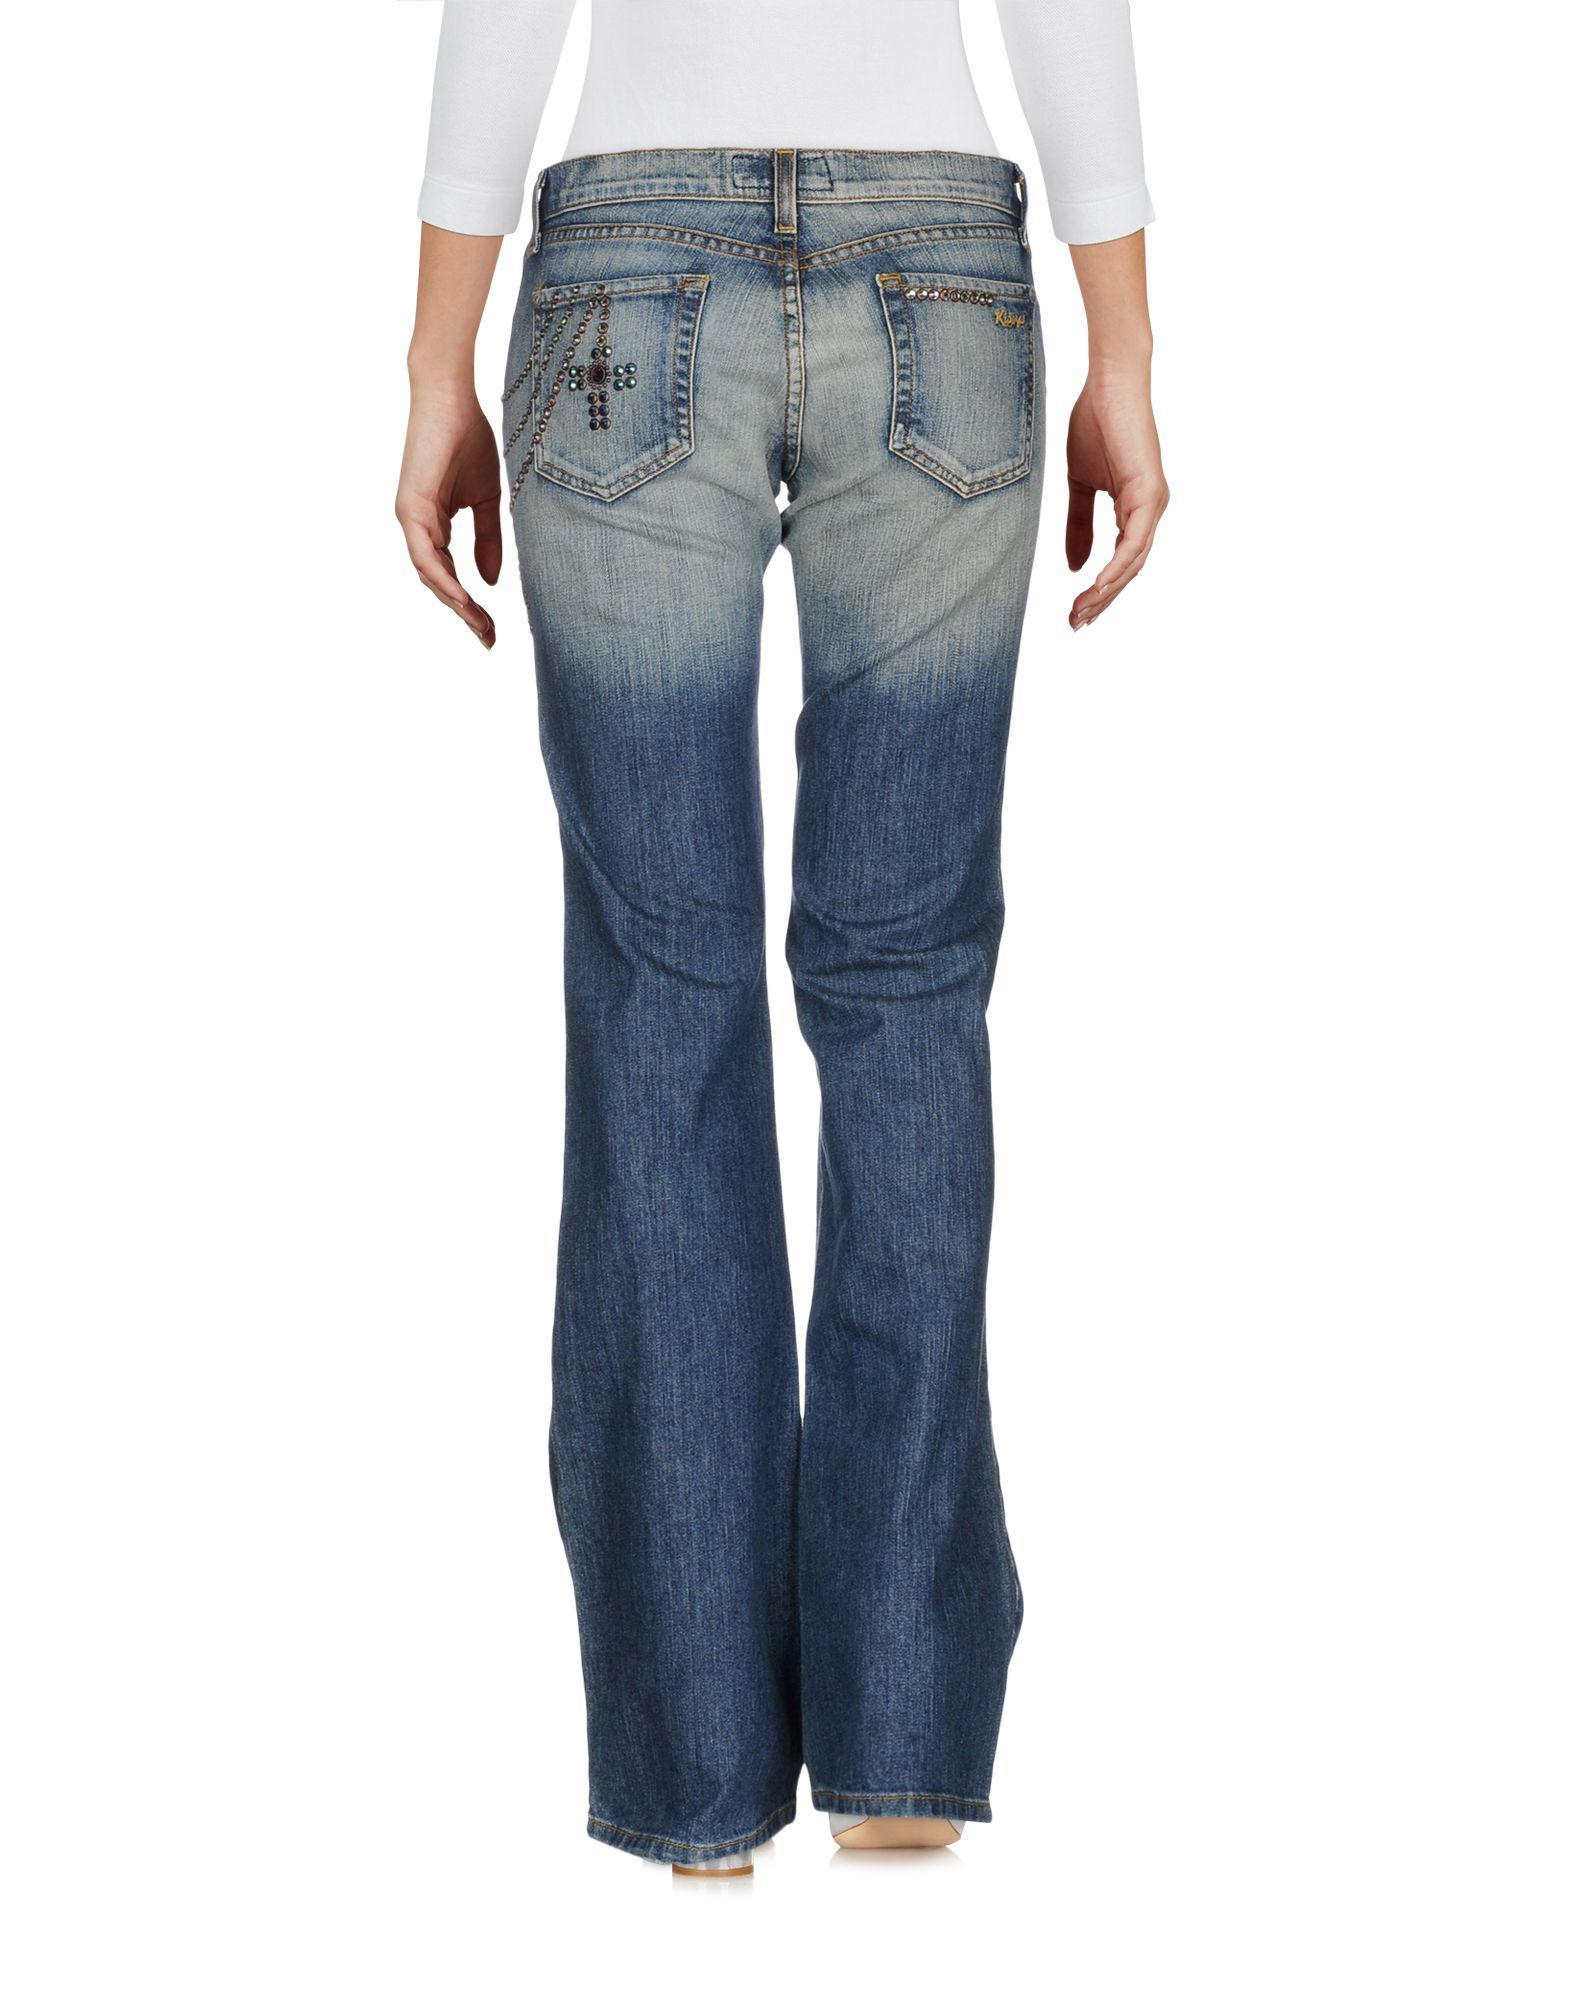 DENIM - Denim trousers Kippys kmGk7